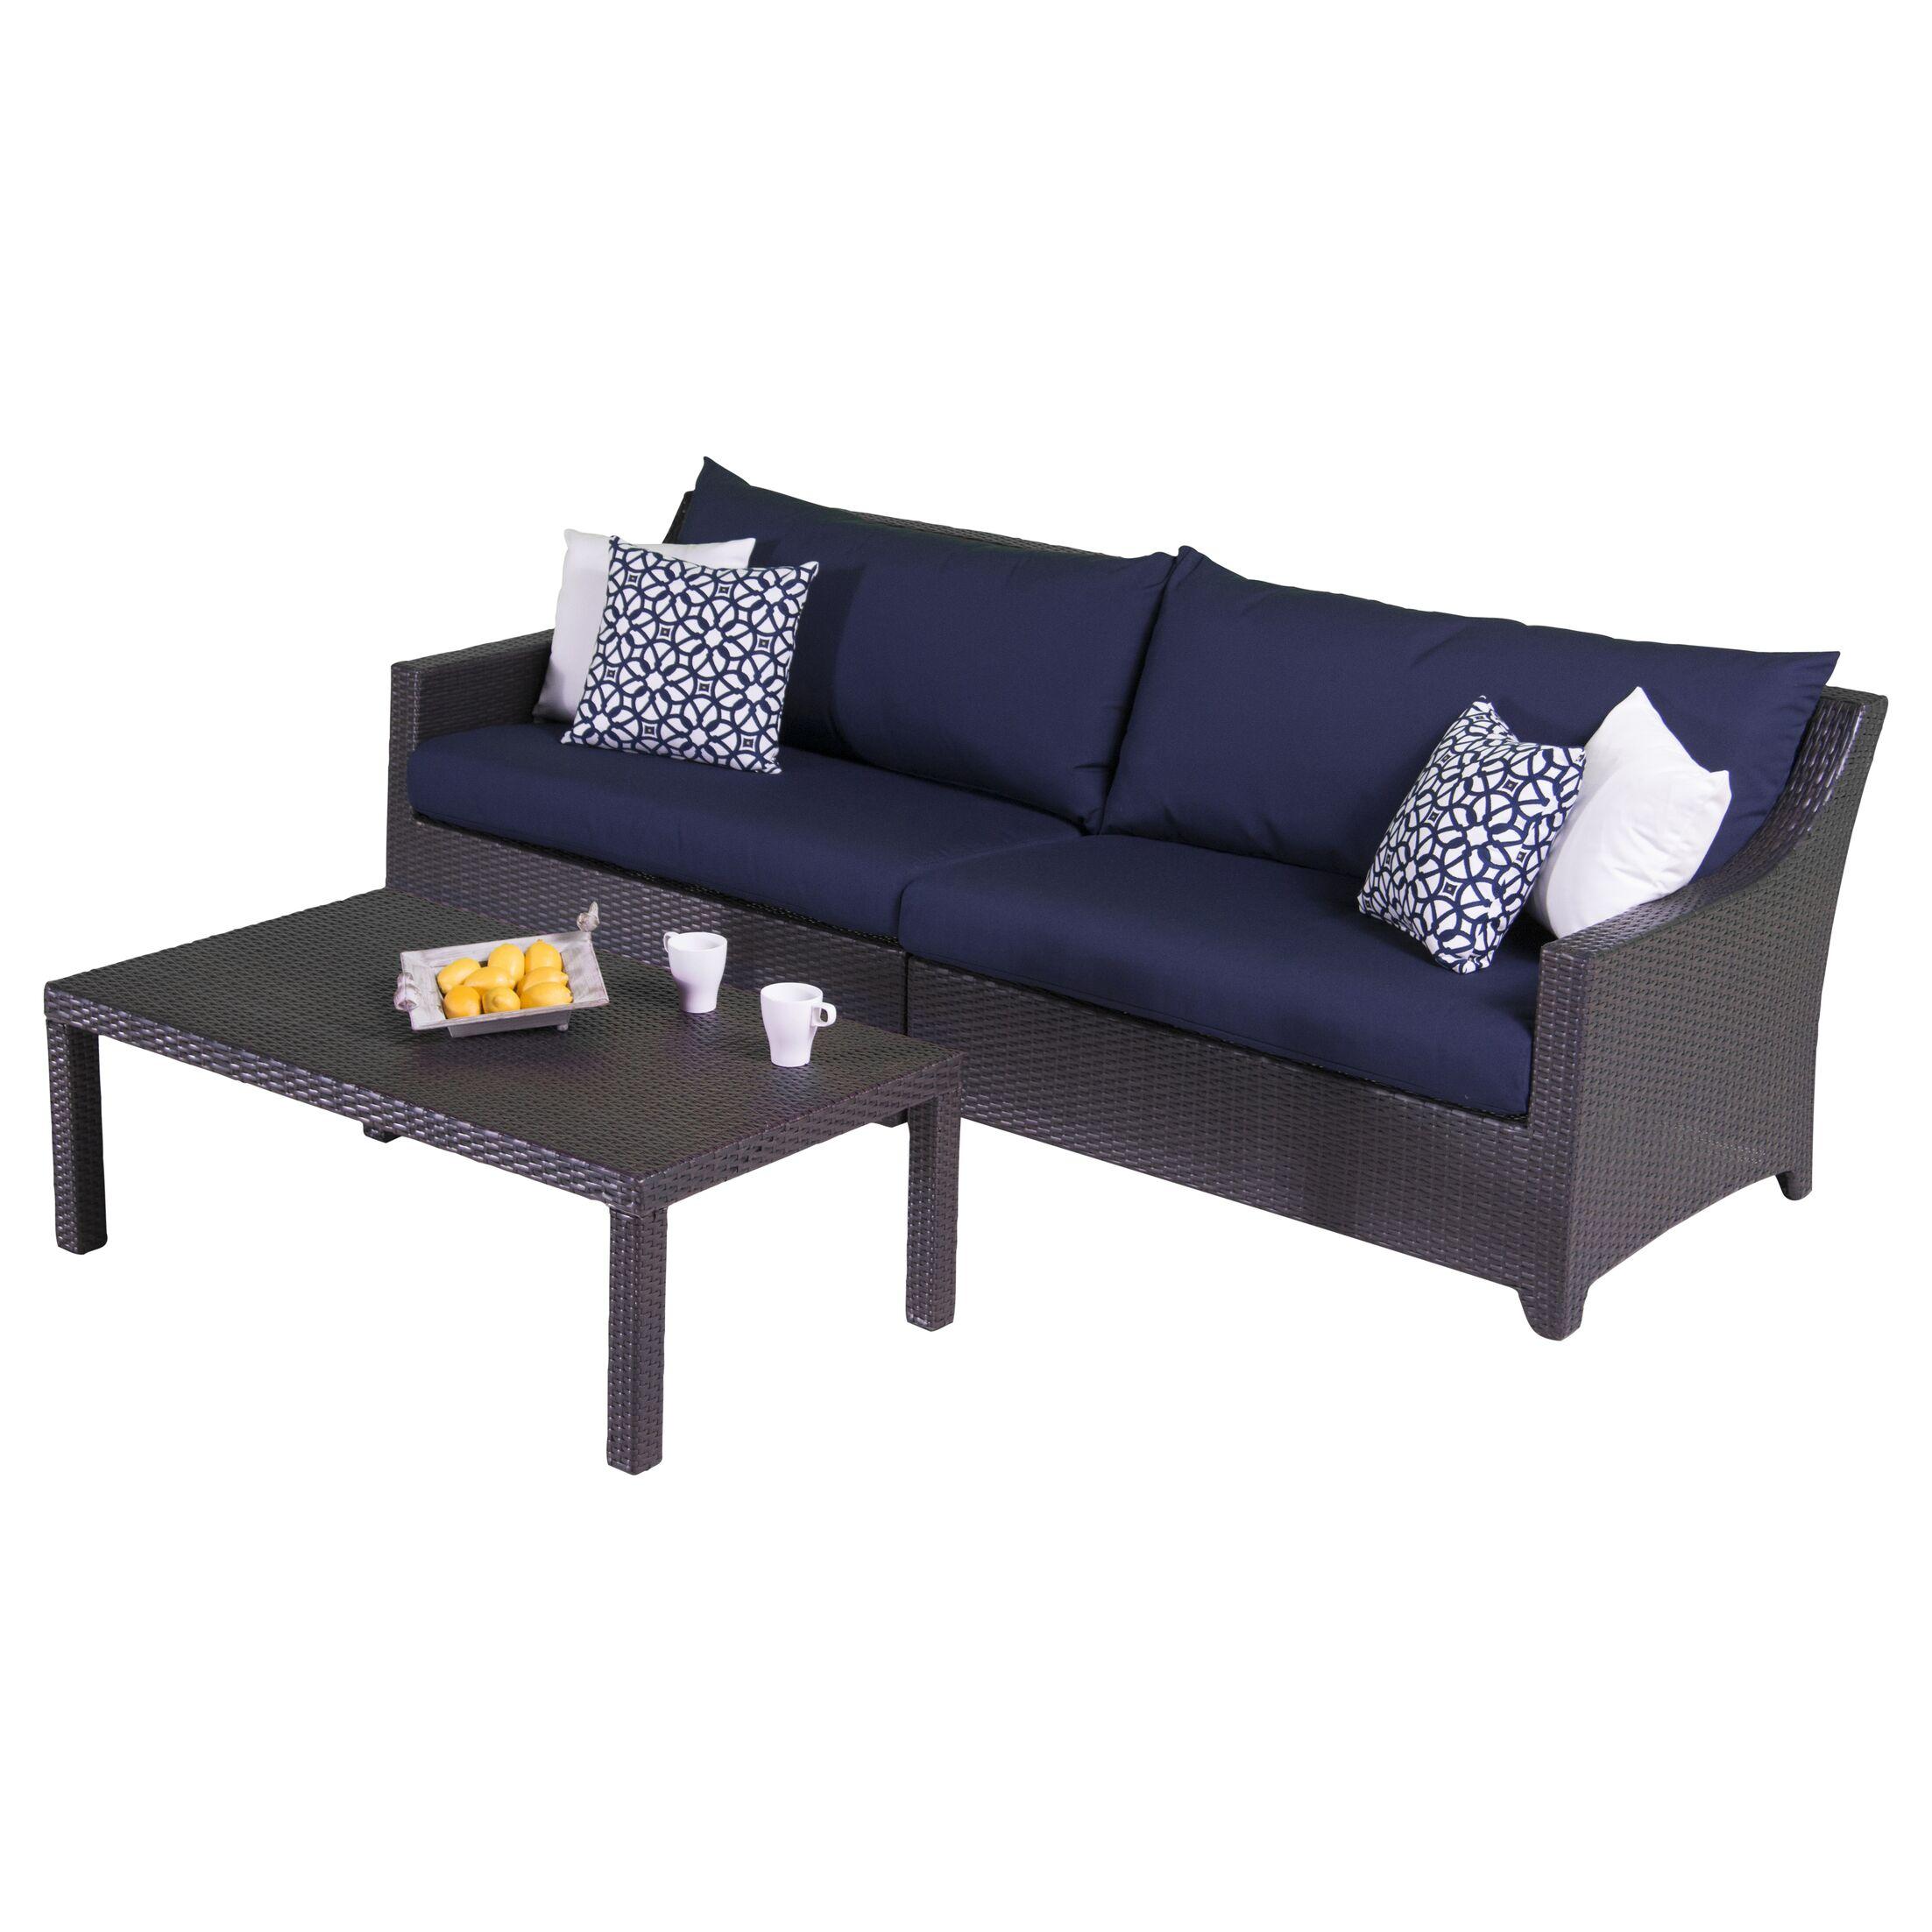 Northridge 2 Piece Sofa Set with Cushions Fabric: Navy